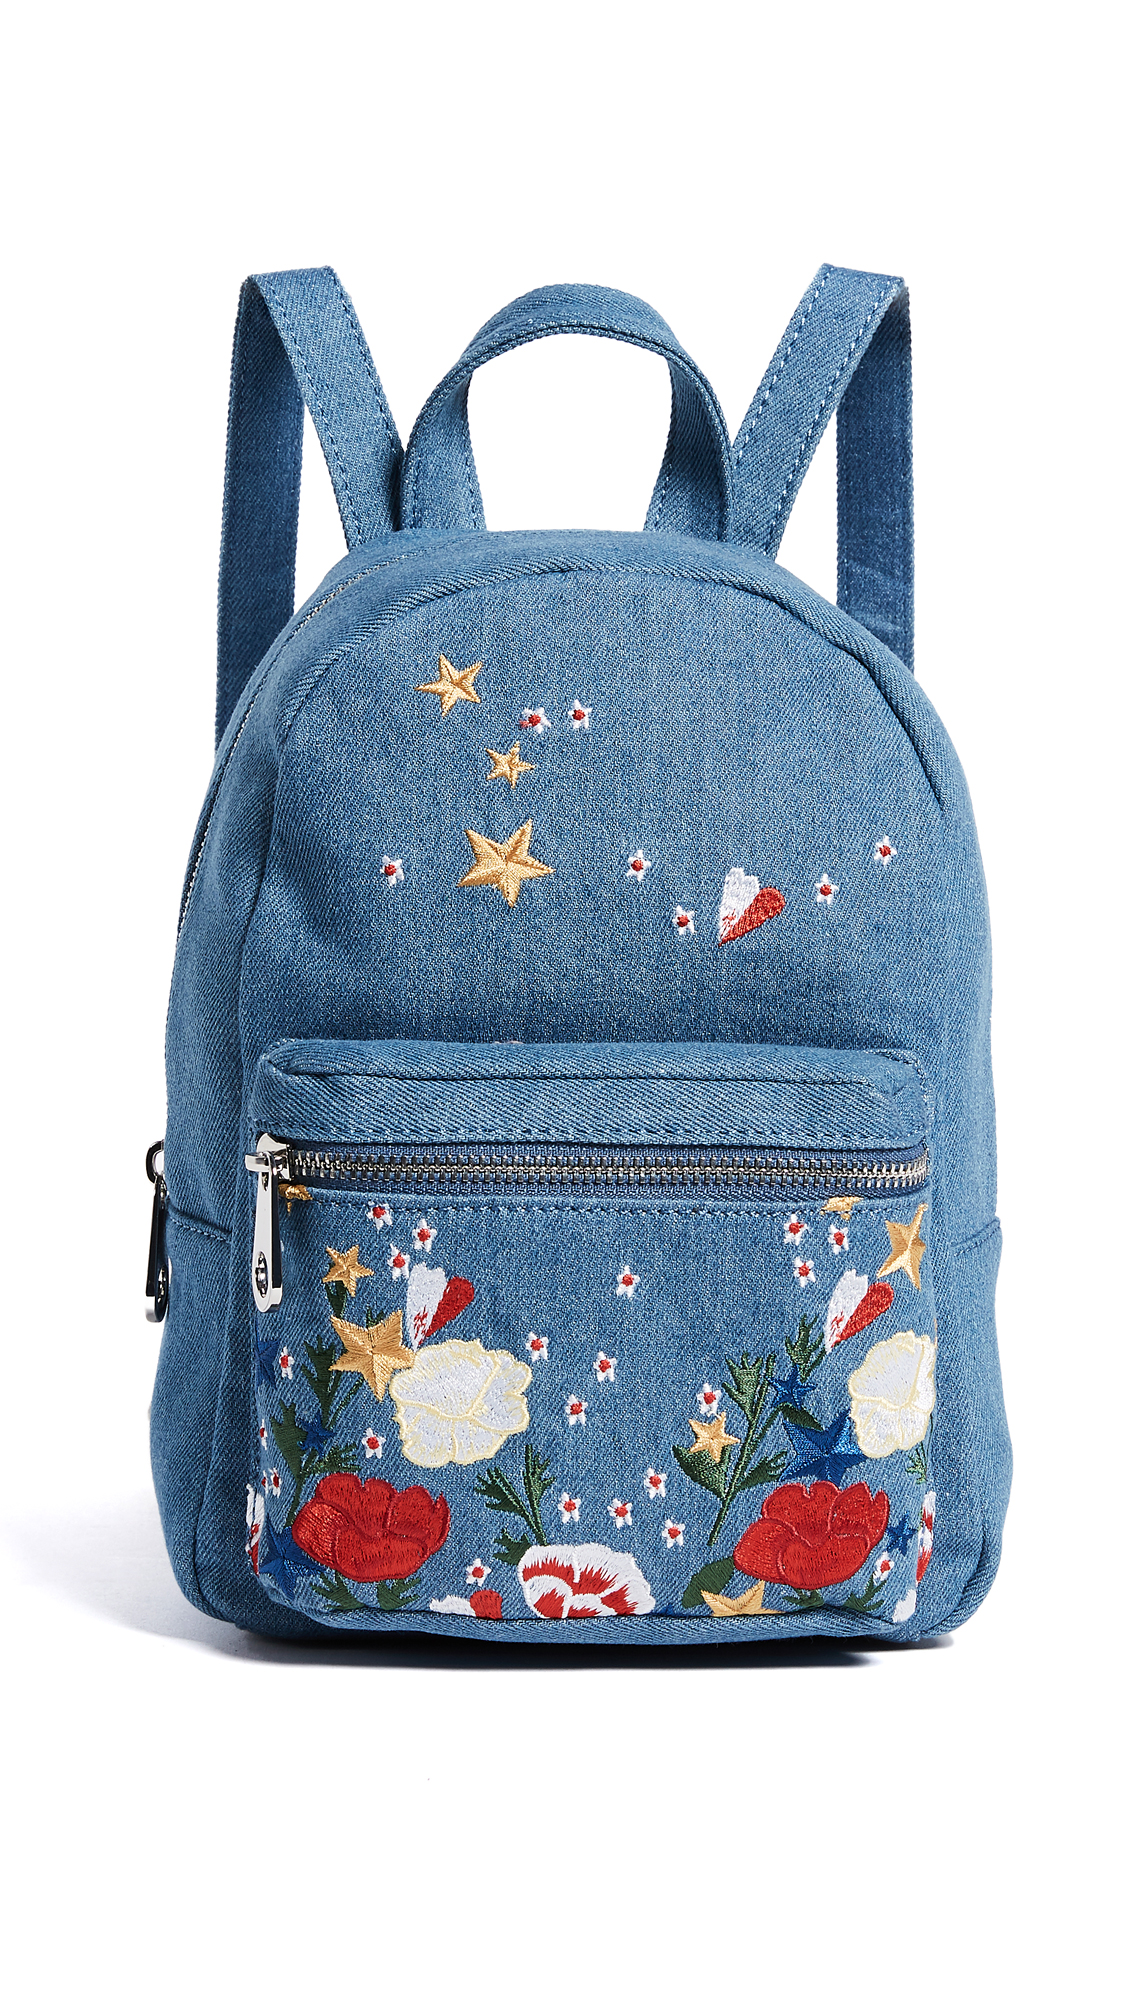 Studio 33 Denim Embroidery Mini Backpack - Denim